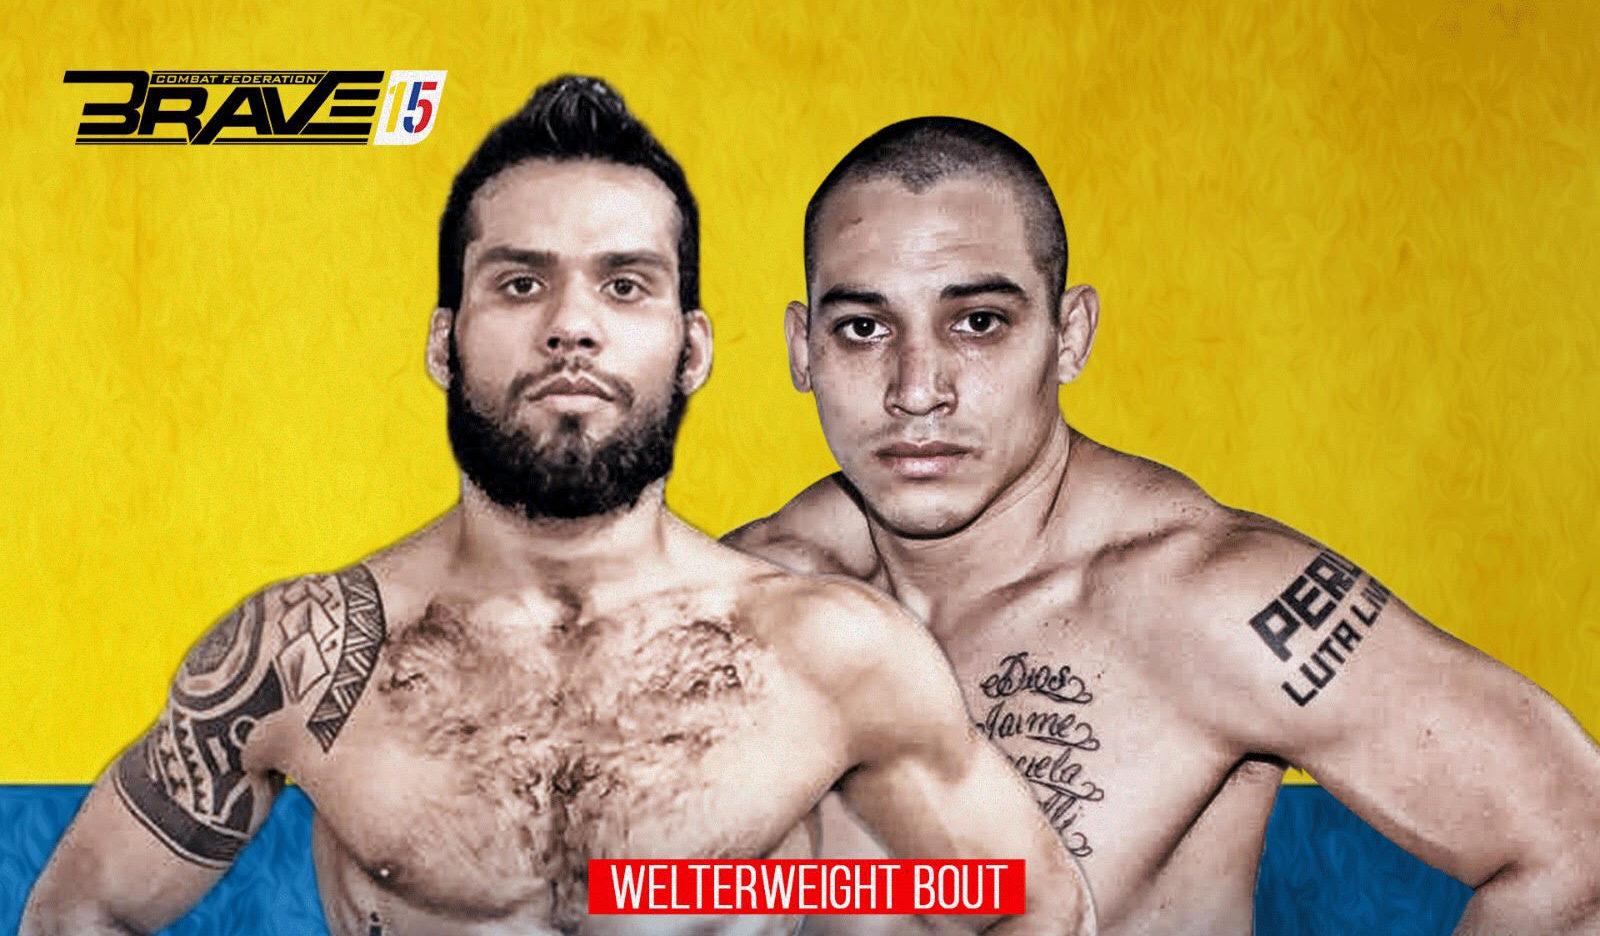 Geraldo Neto debuts against Jaime Cordova at Brave 15 -